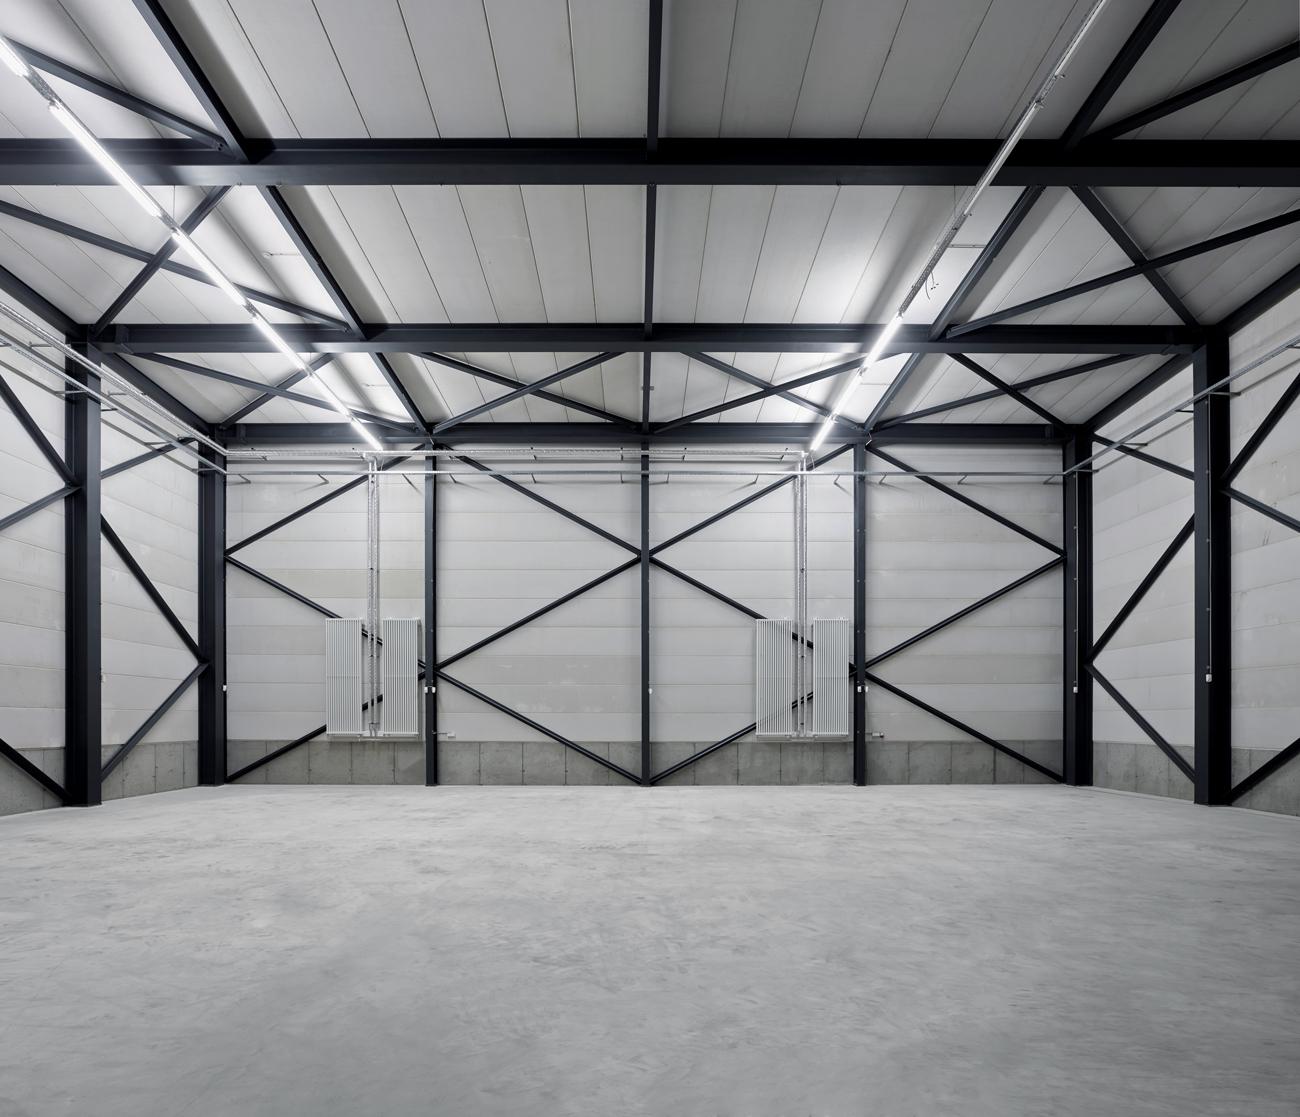 archiv-gebaeude-6-tanja-lincke-architekten